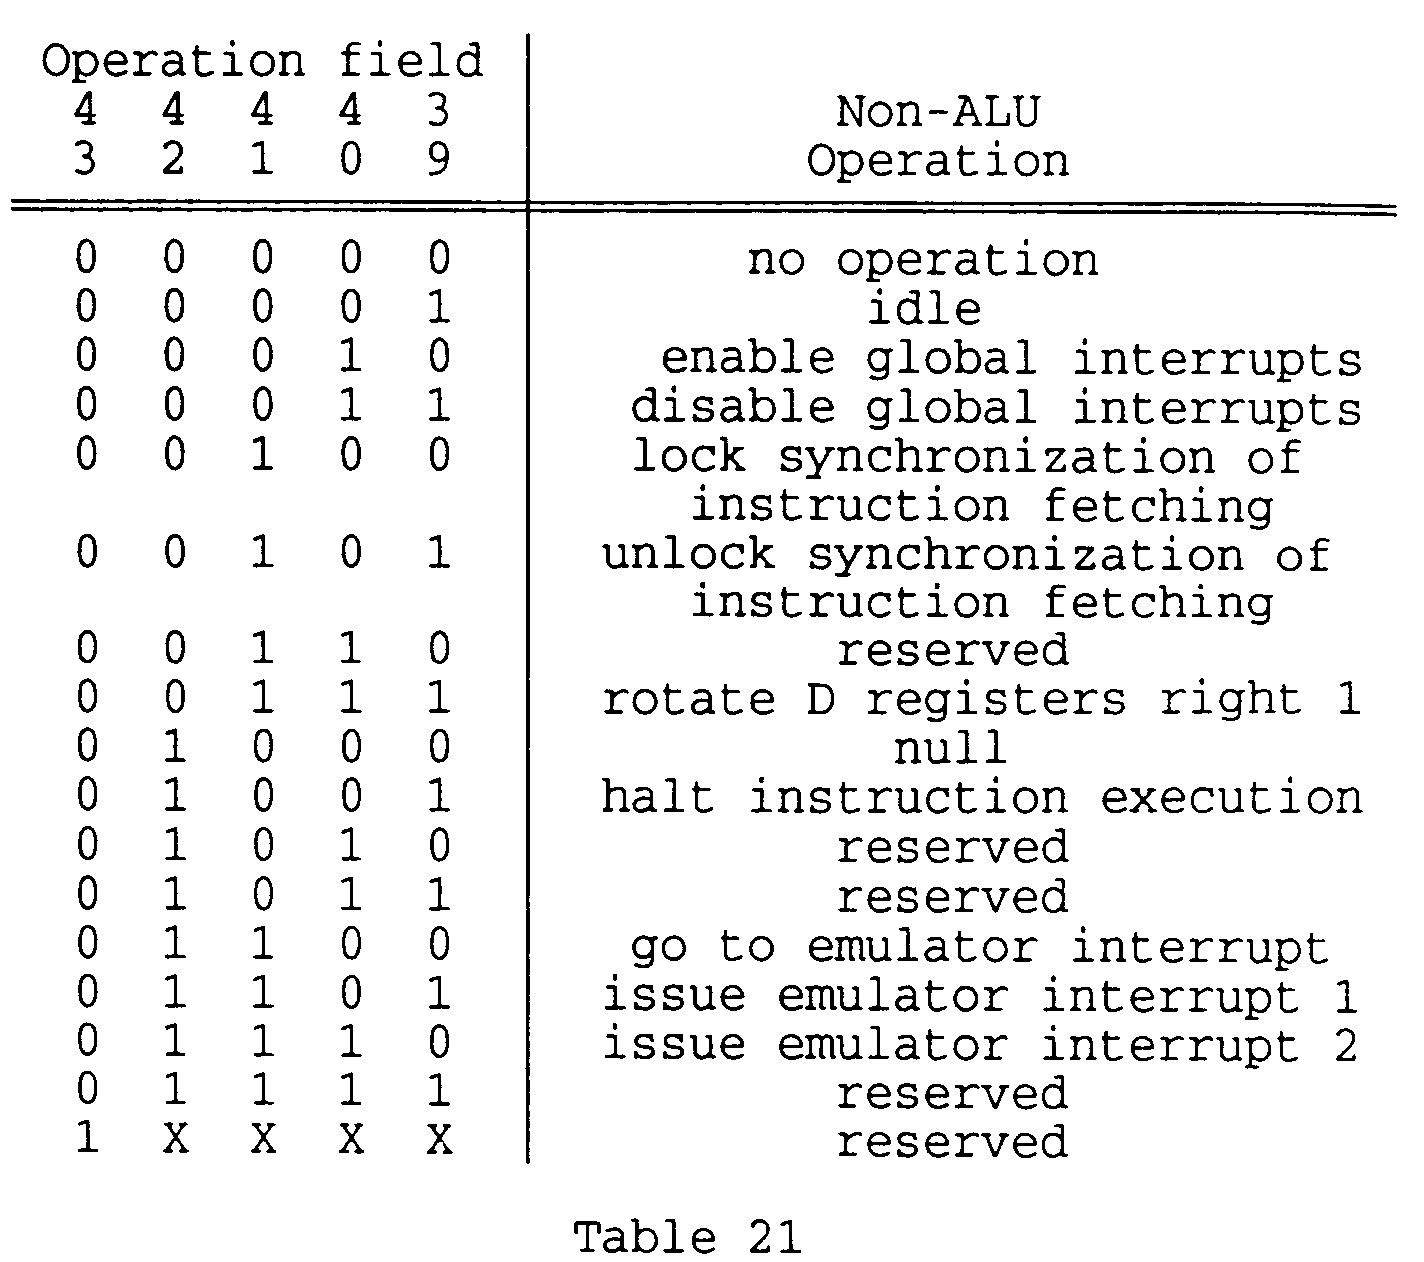 hight resolution of the non arithmetic logic unit instructions null halt instruction execution go to emulator interrupt issue emulator interrupt 1 and issue emulator